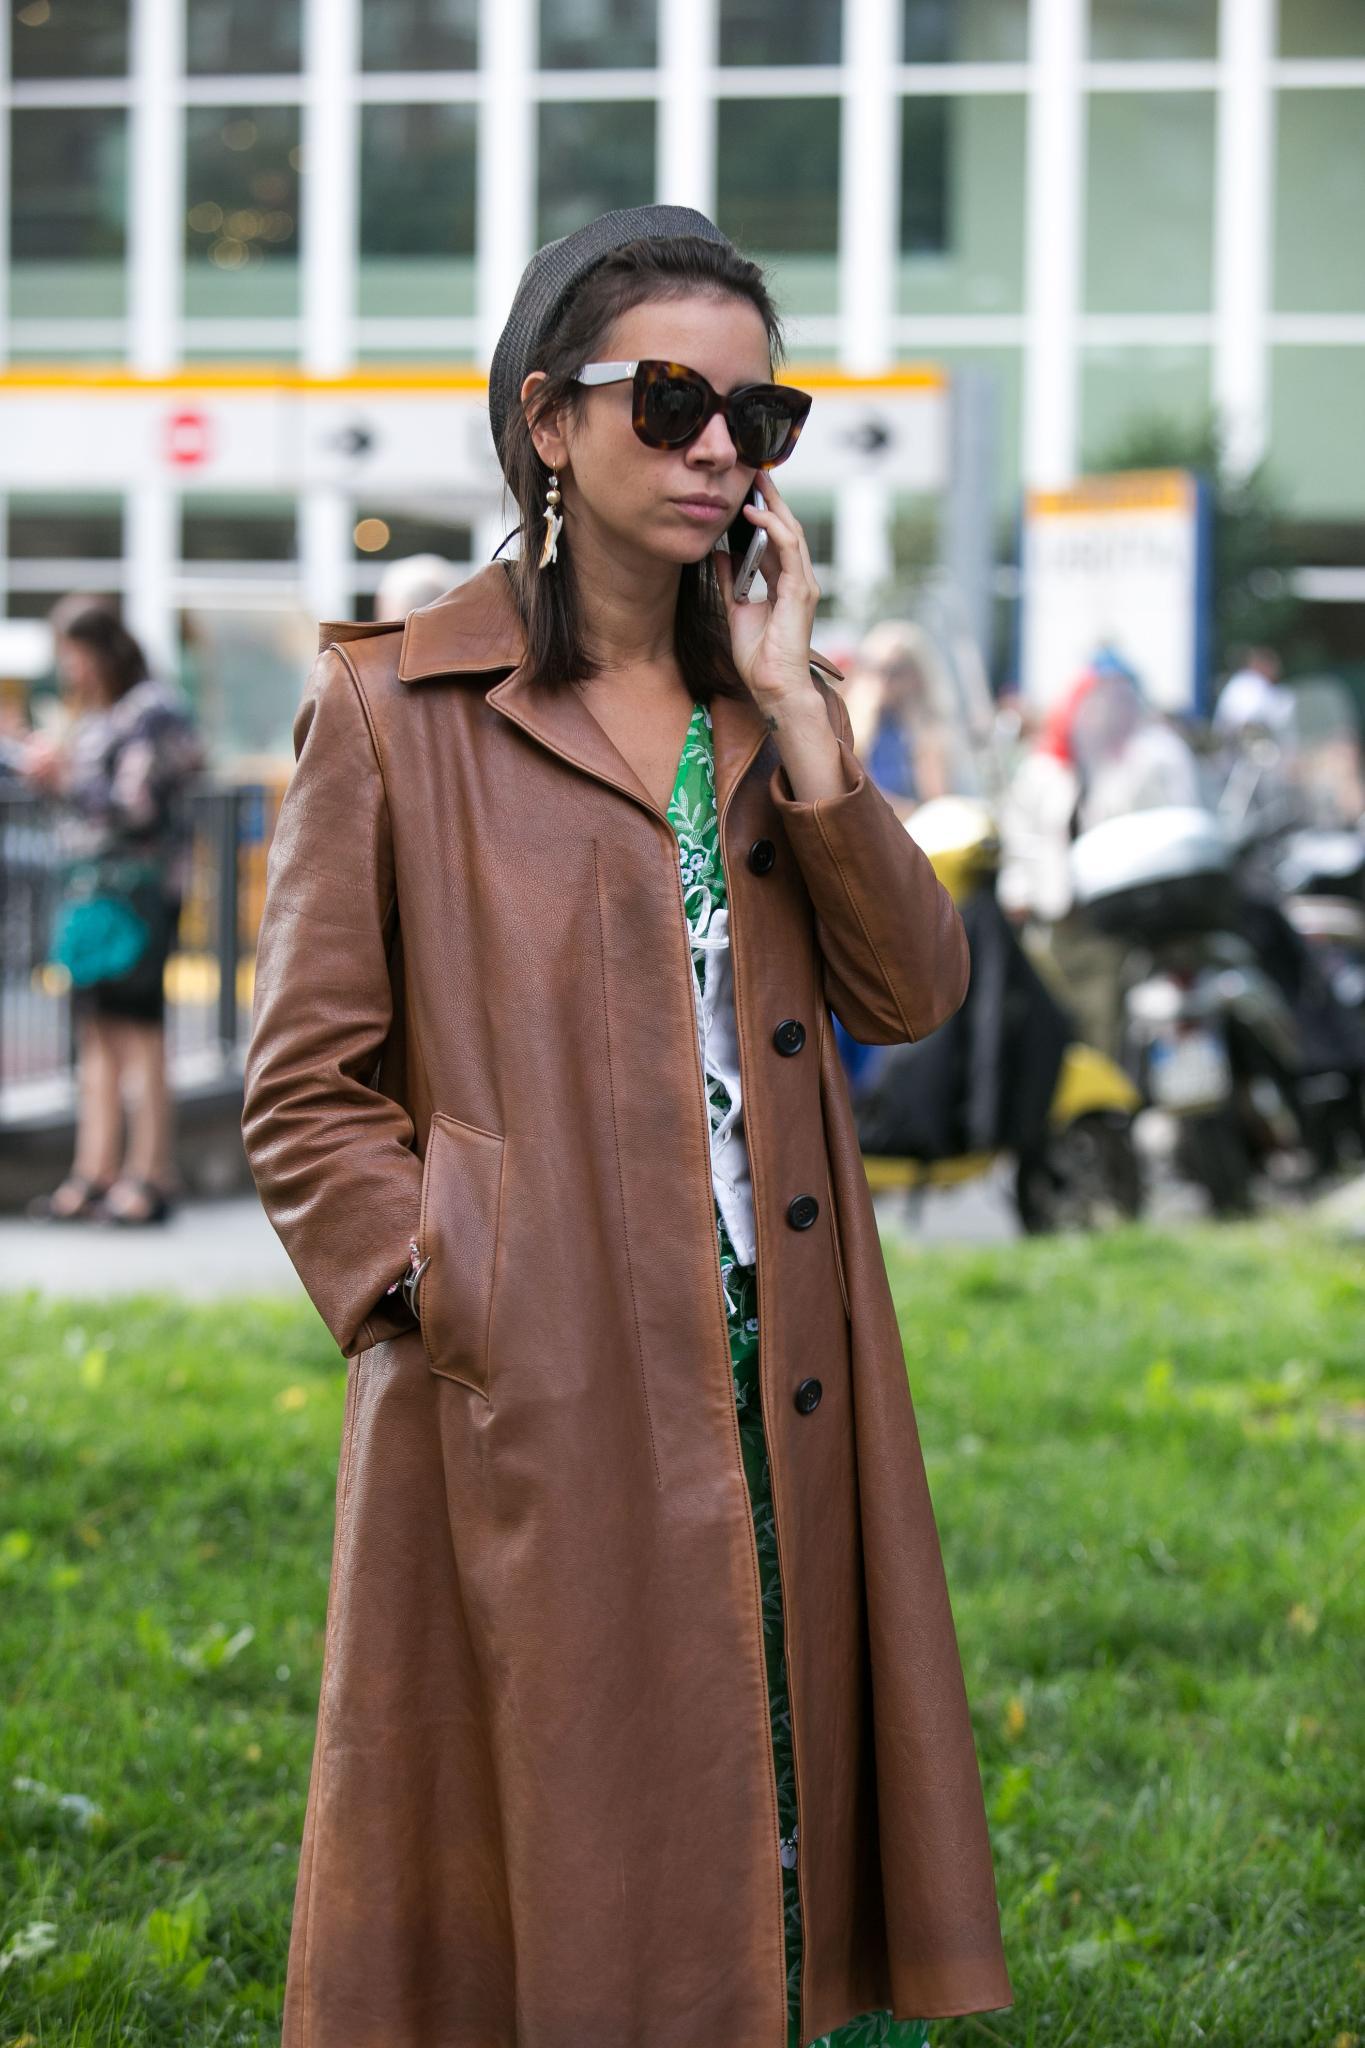 Short cuts: Miroslava Duma accessorising short hair with a hat at Fashion Week